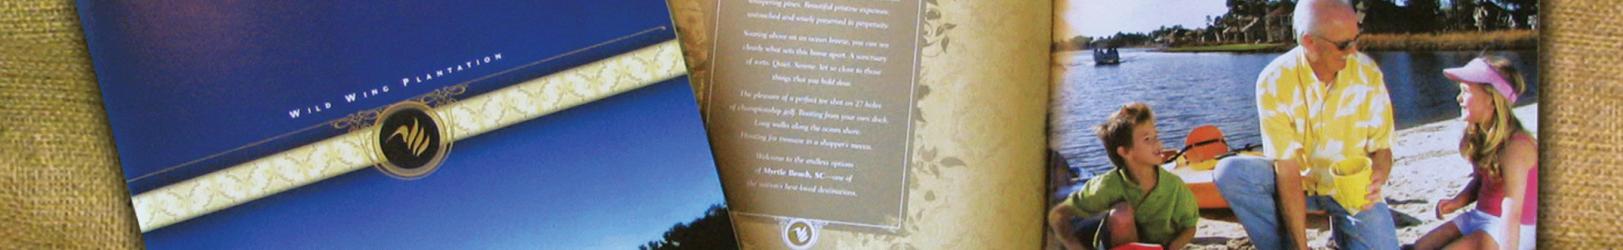 Wild Wing Plantation Brochure